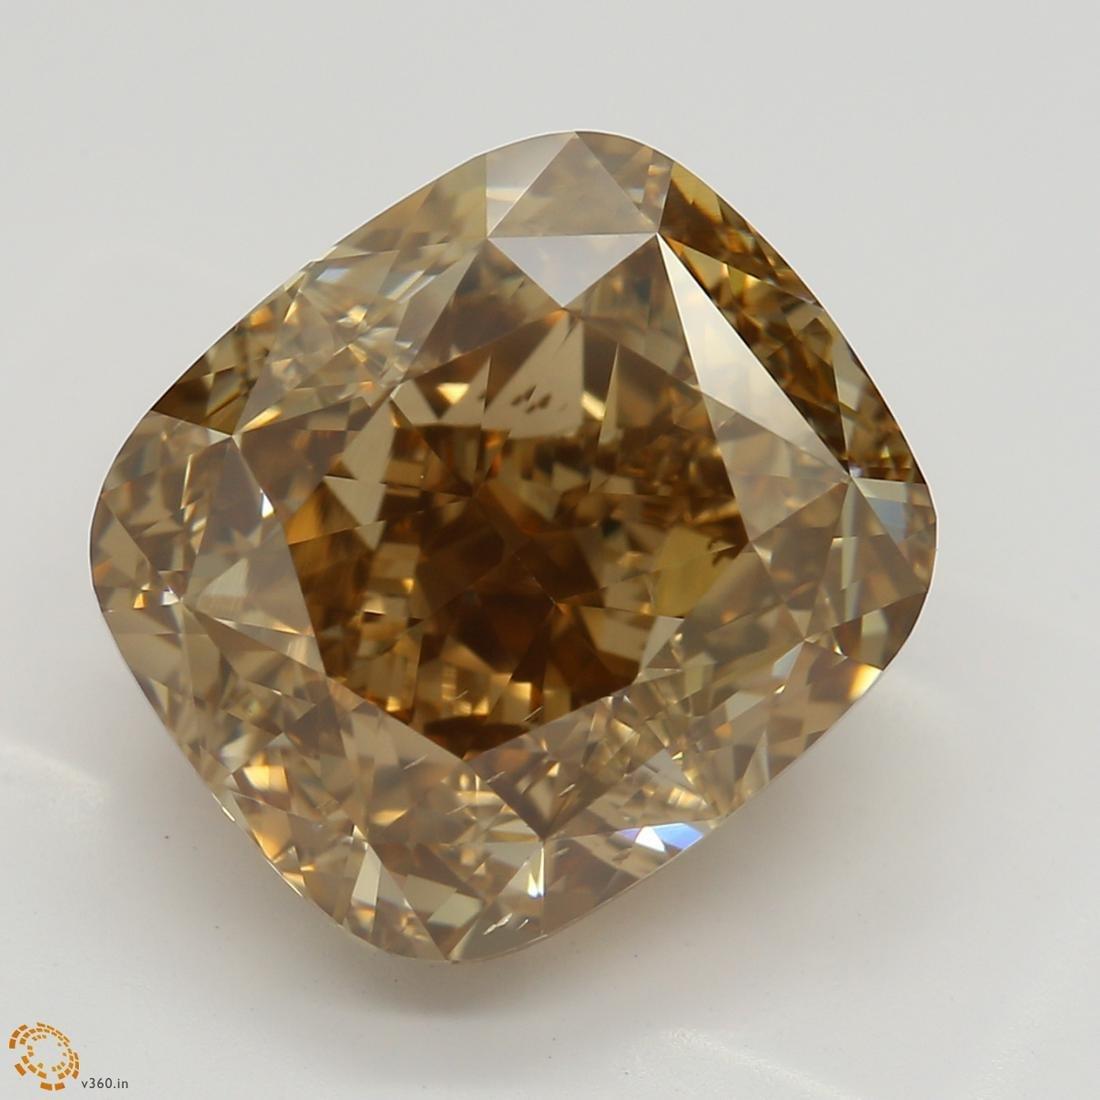 6.04 ct, Orange-Brn./VS2, Cushion cut Diamond